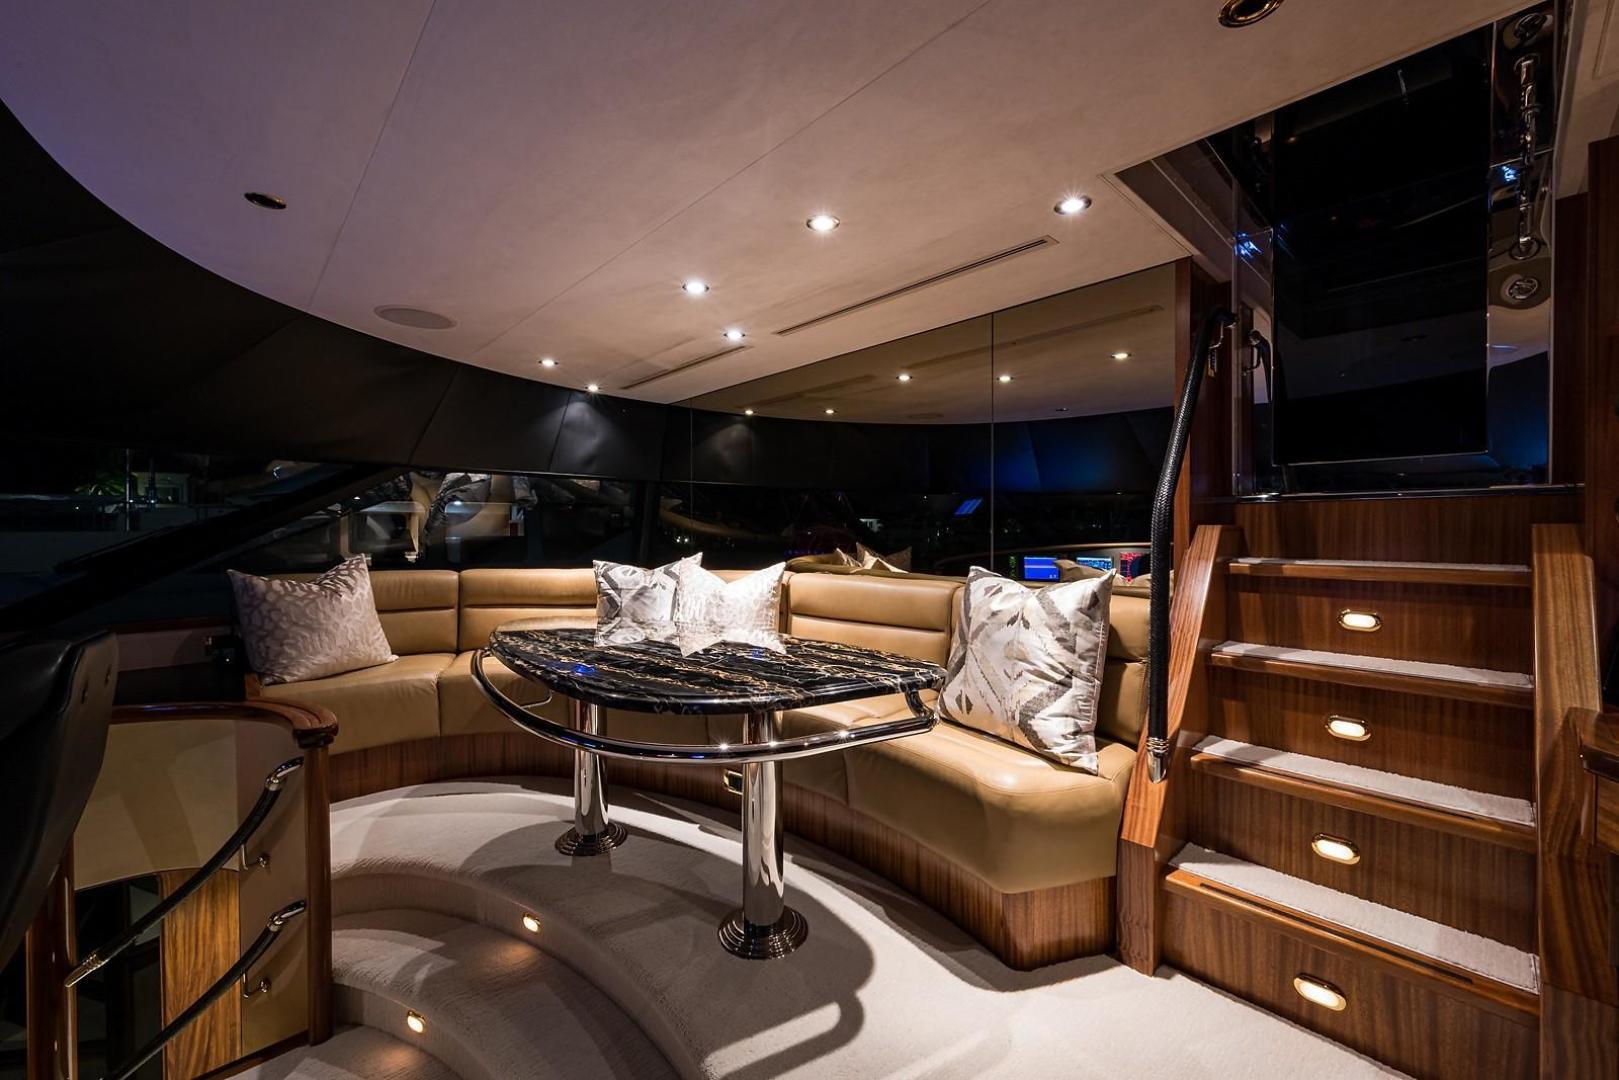 Westport-Motoryacht 2010-Cavallino Fort Lauderdale-Florida-United States-Pilothouse/Settee-1270133 | Thumbnail